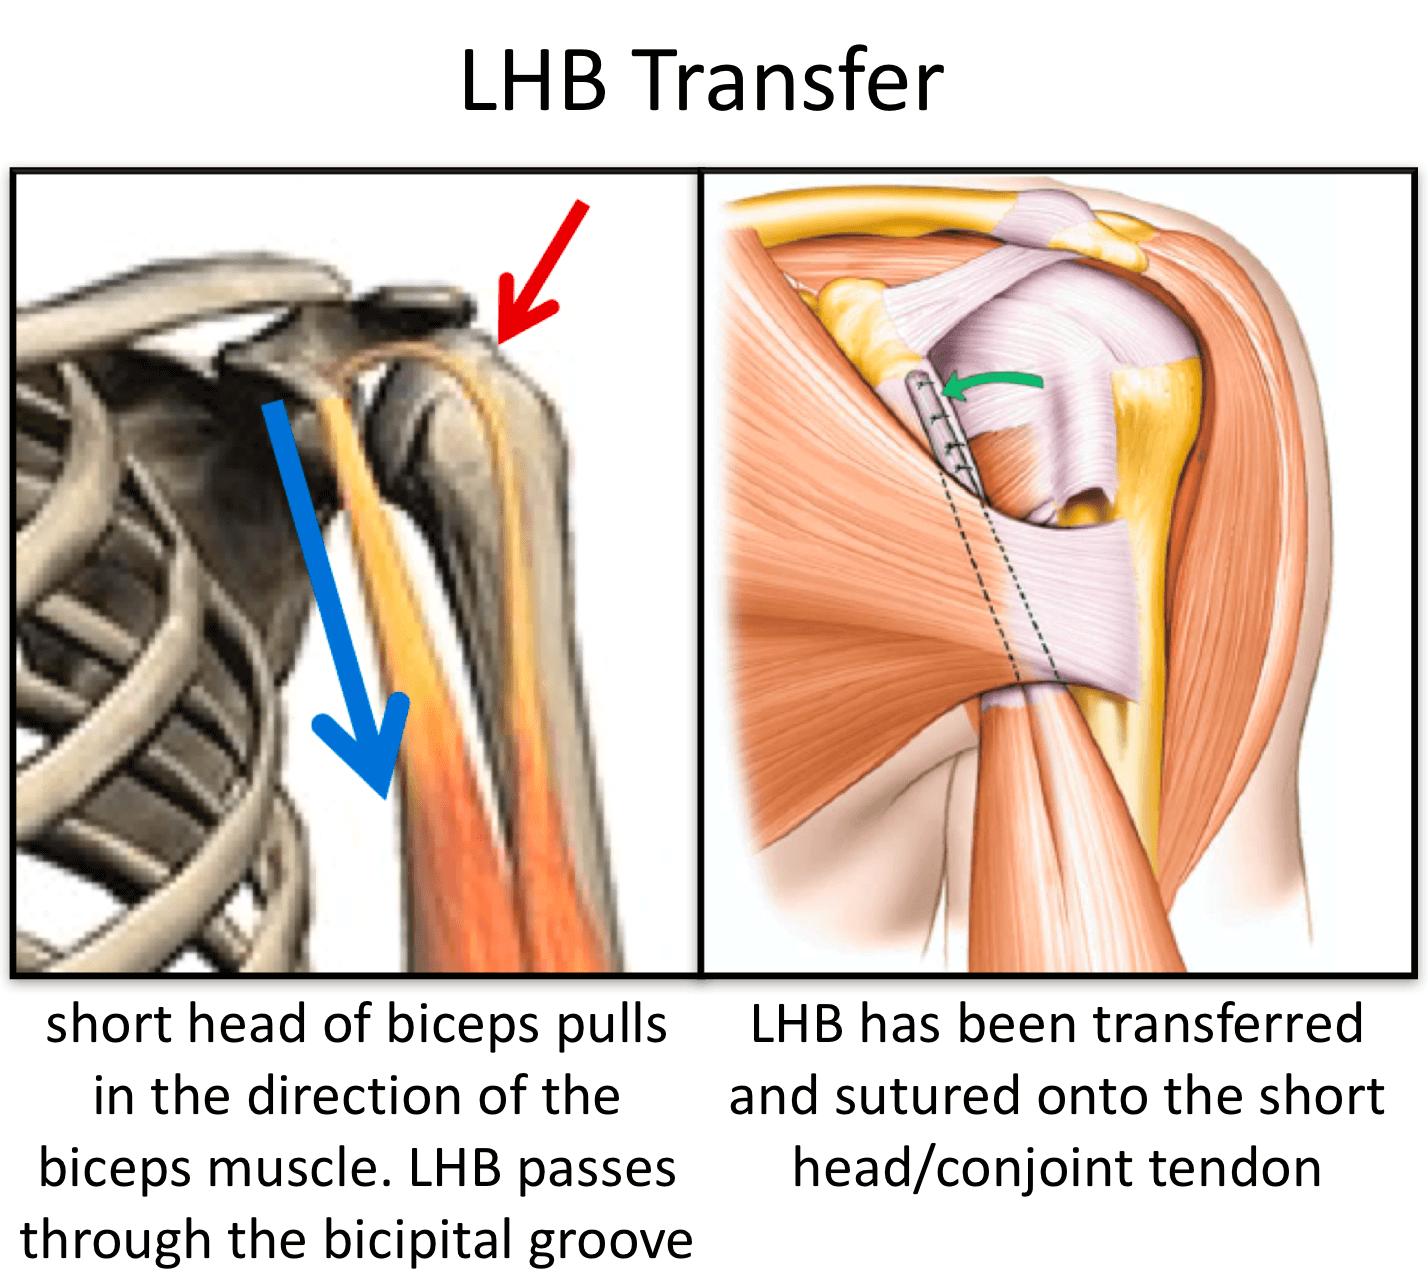 Fig 14. LHB Transfer